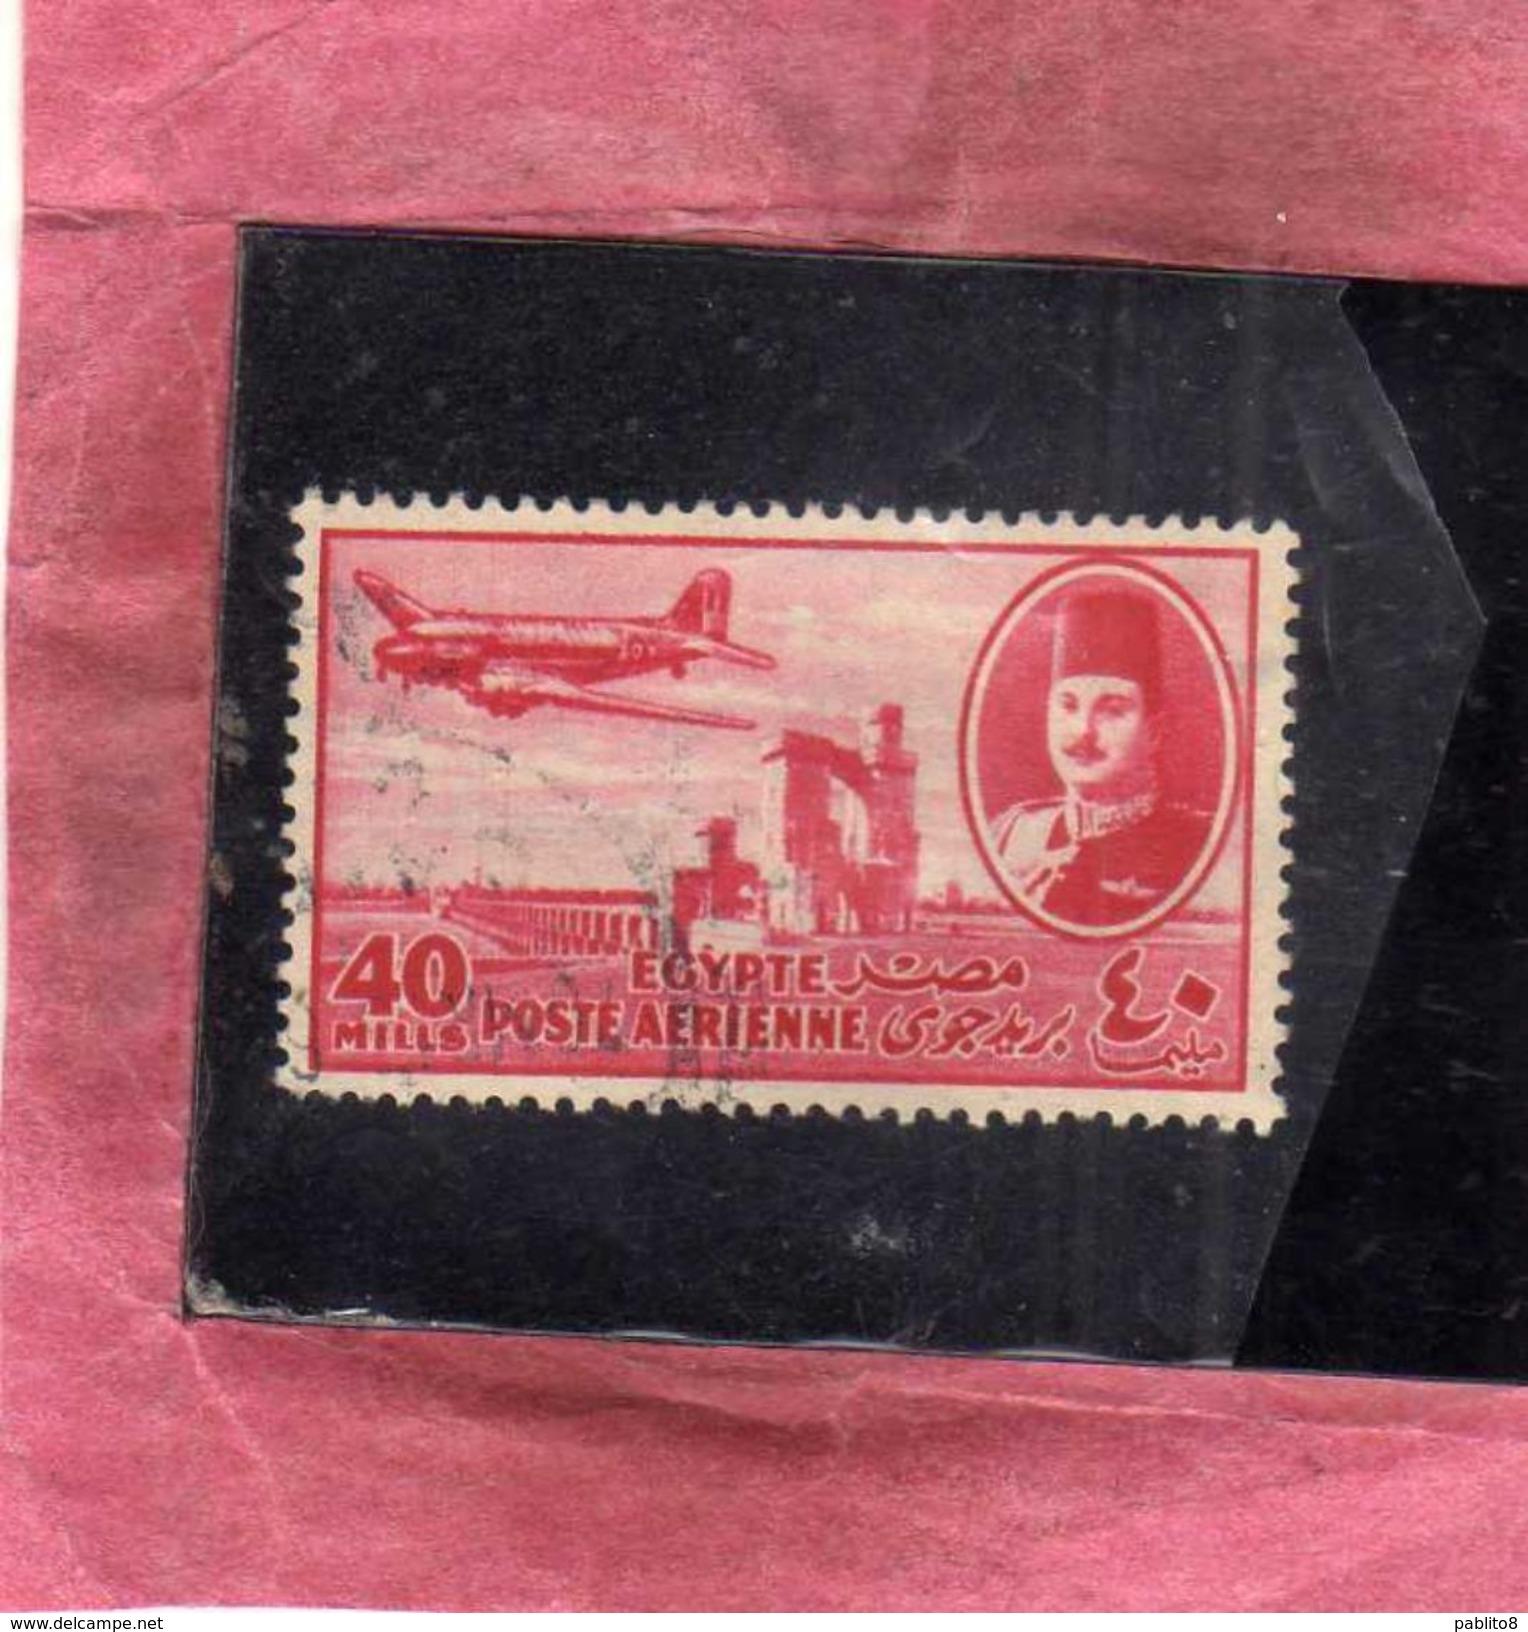 EGYPT EGITTO 1947 AIR MAIL POSTA AEREA KING FAROUK DELTA DAM DC-3 PLANE 40m USATO USED OBLITERE' - Posta Aerea